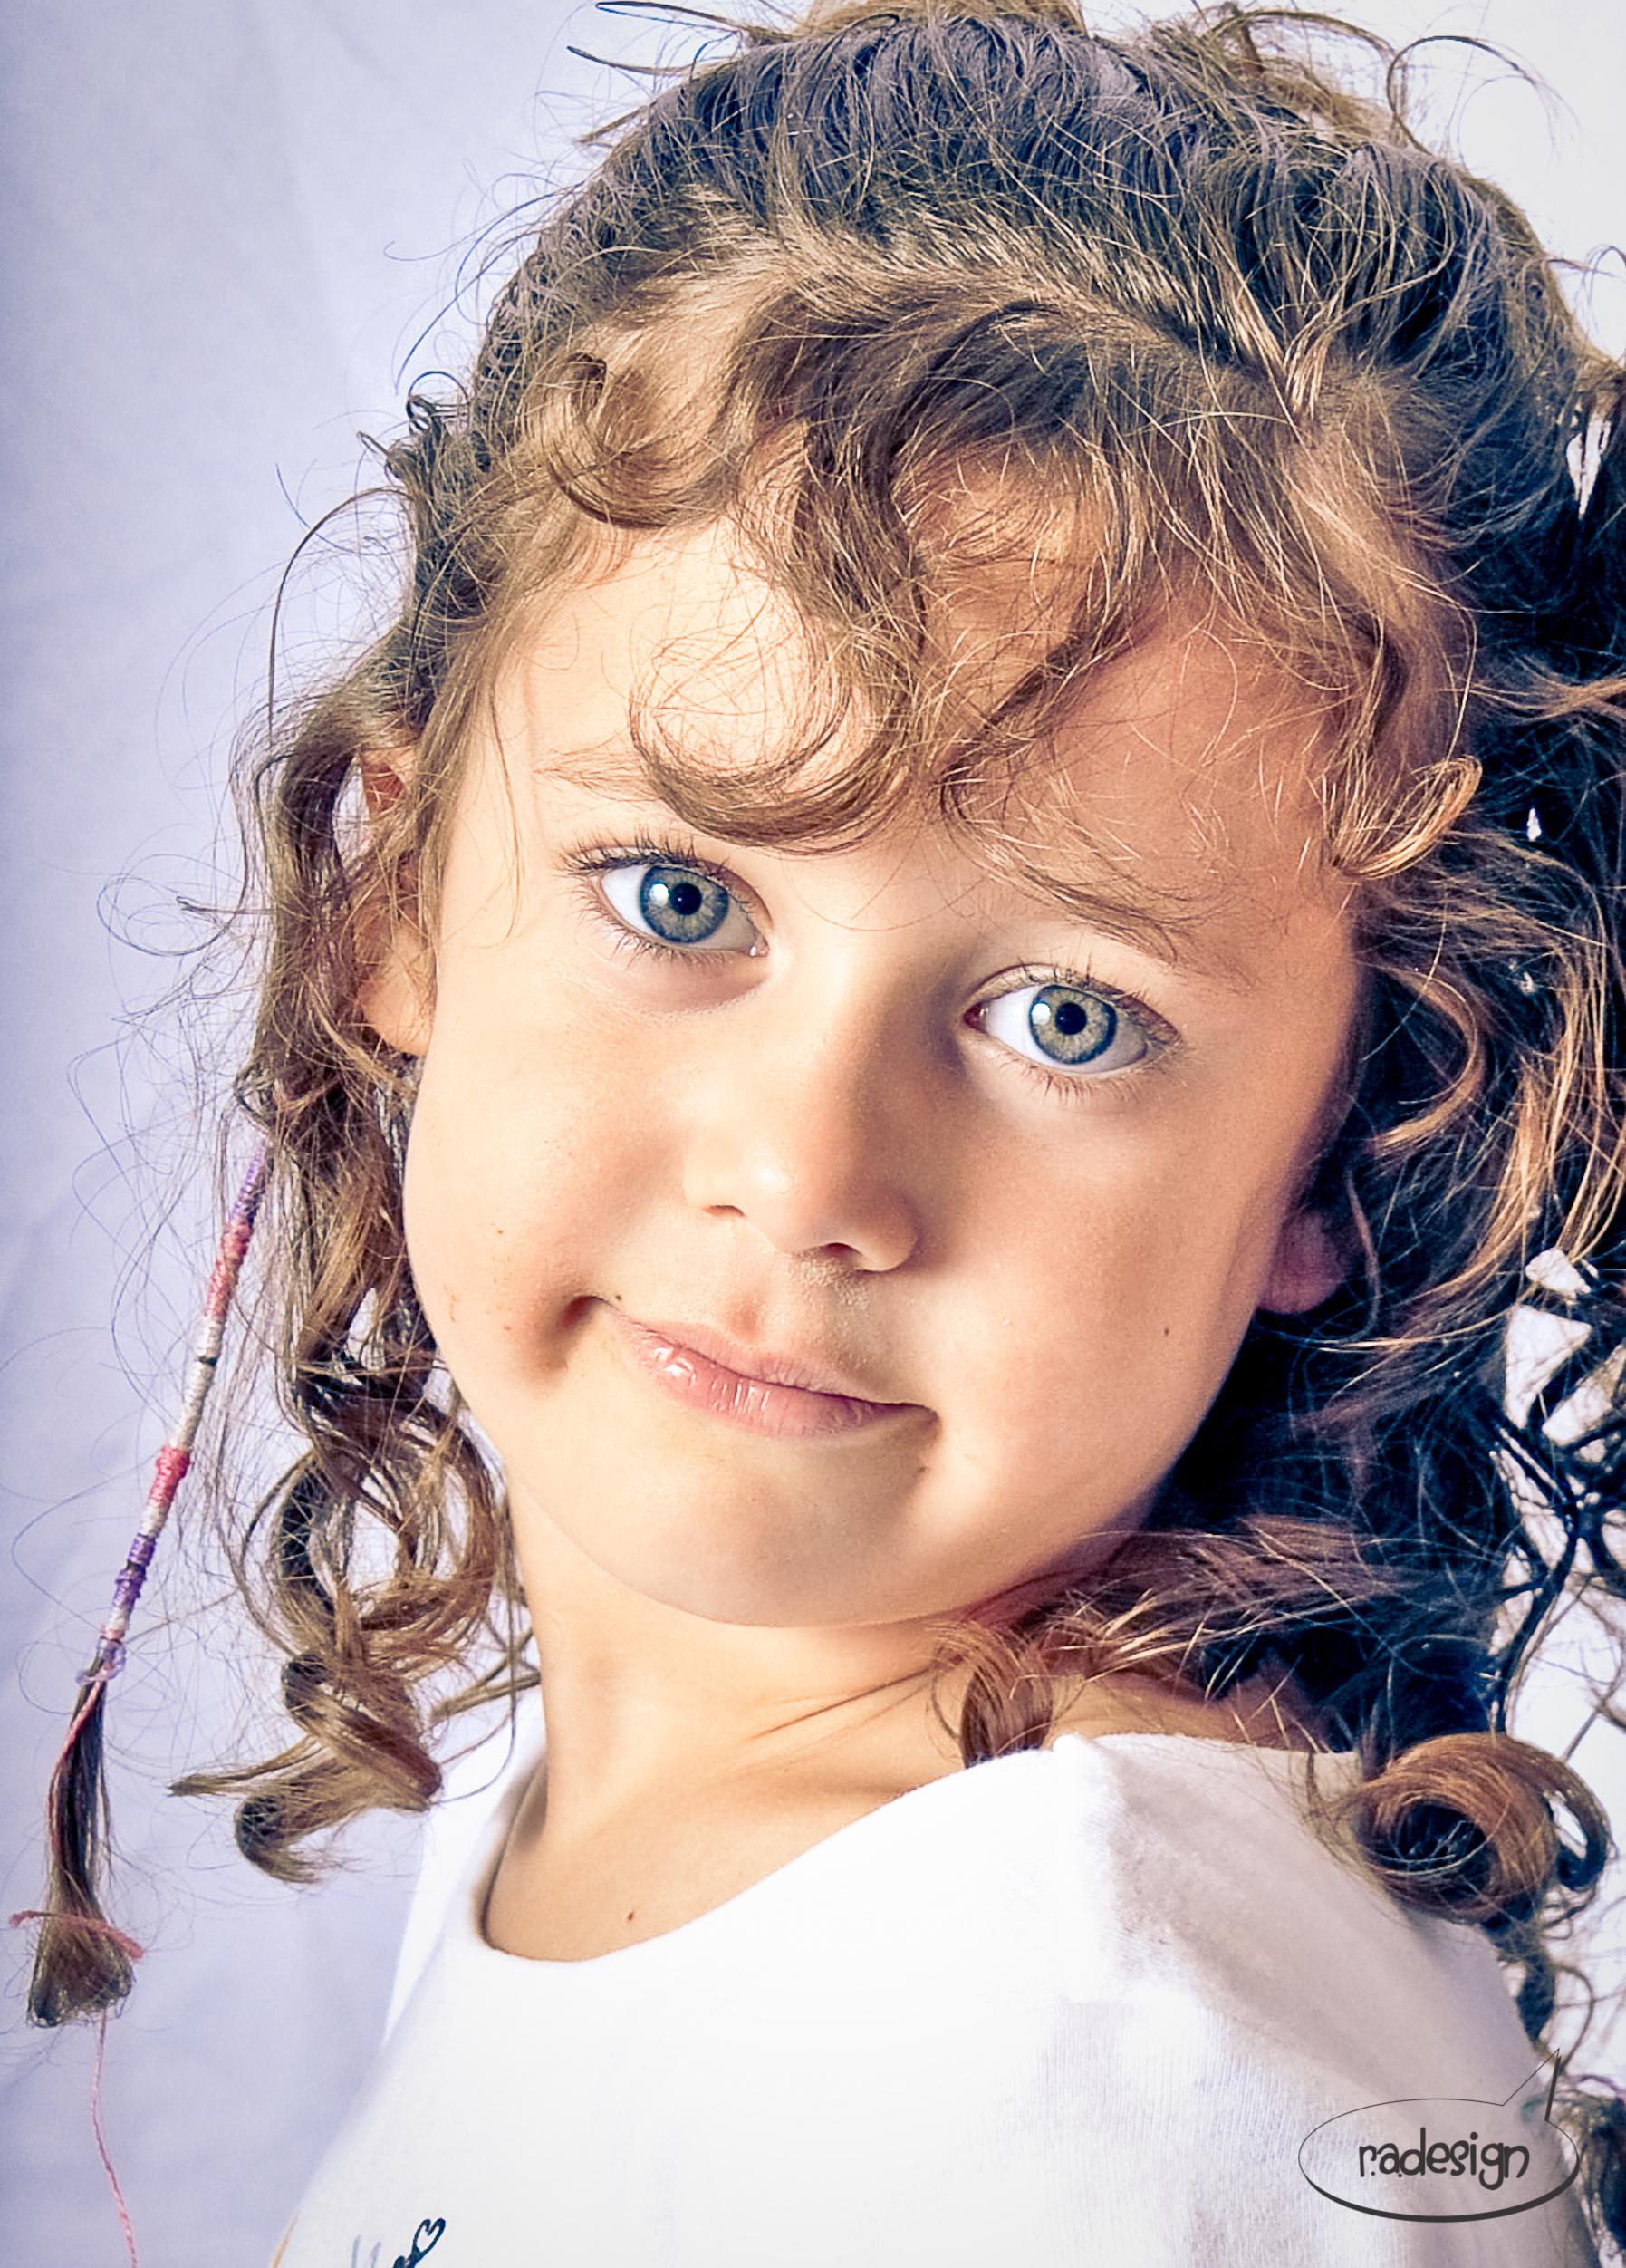 10 Anos Ana Luisa 020.jpg